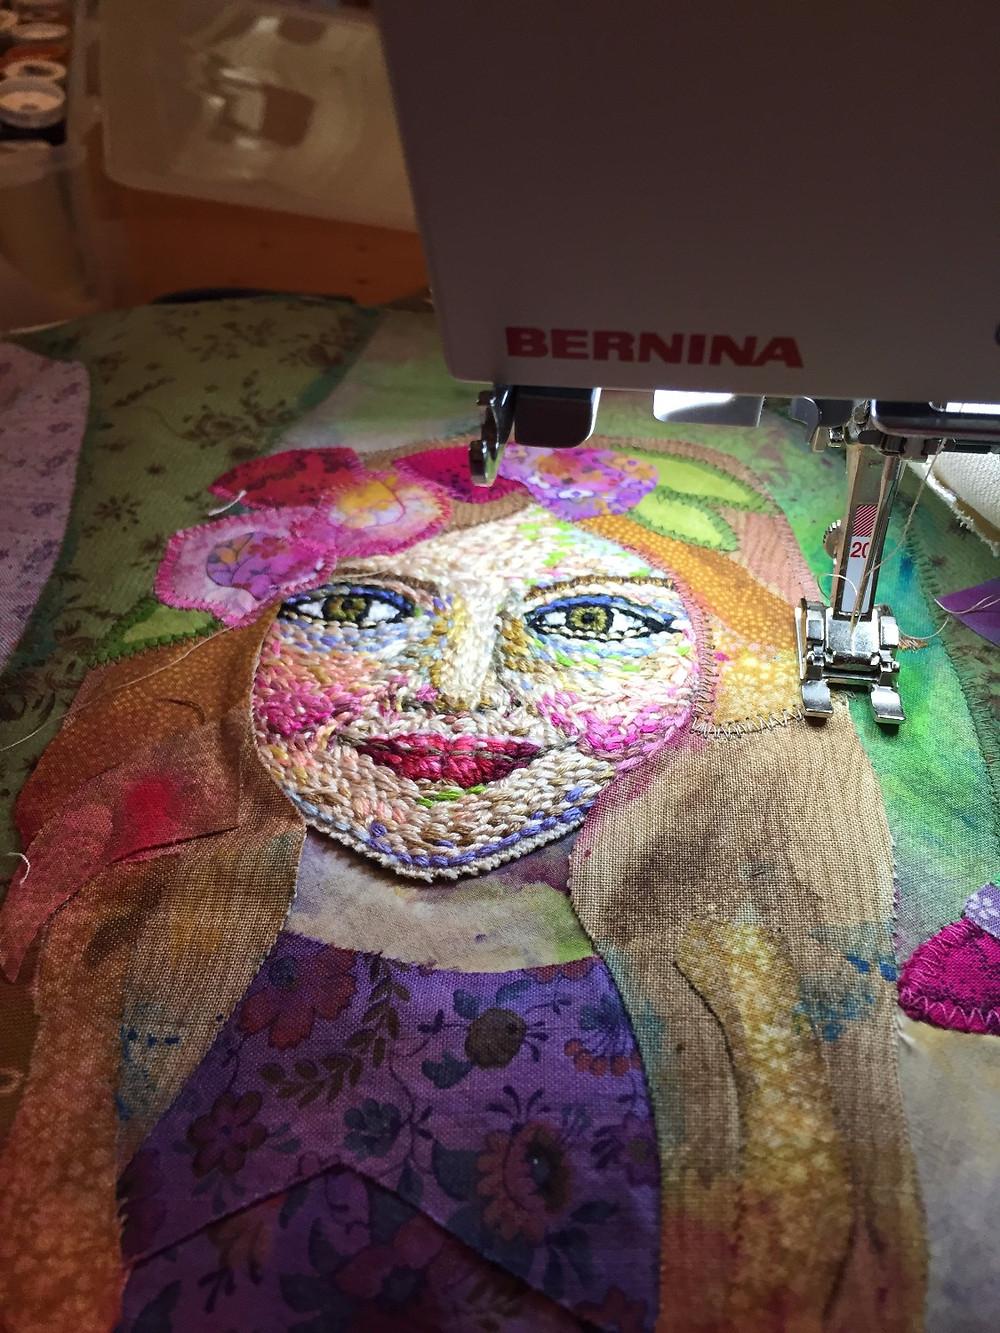 machine stitching and hand embroidery